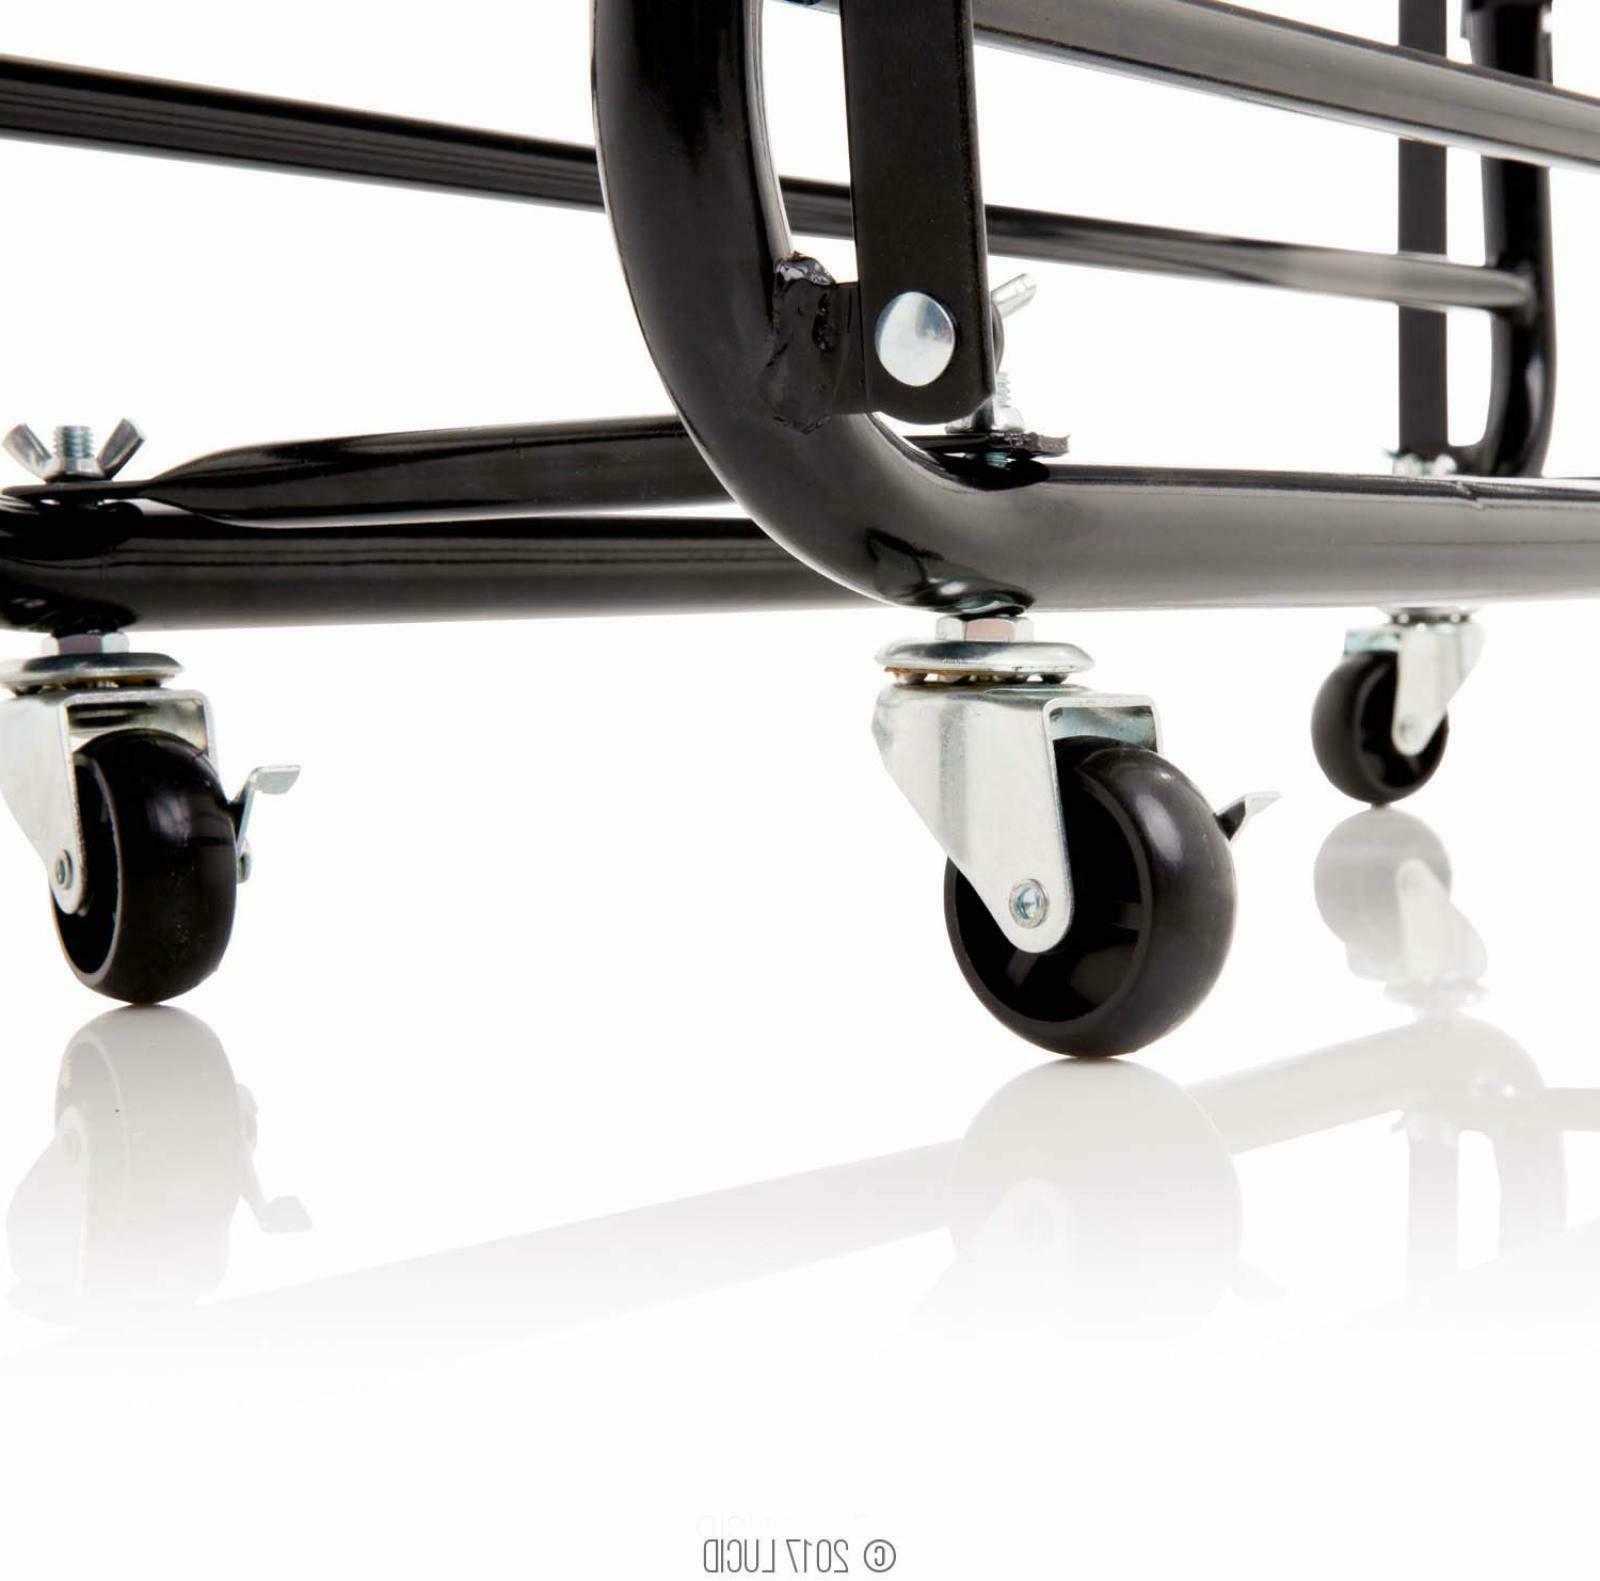 Twin XL Guest Bed Folding Memory Mattress Rolling Frame